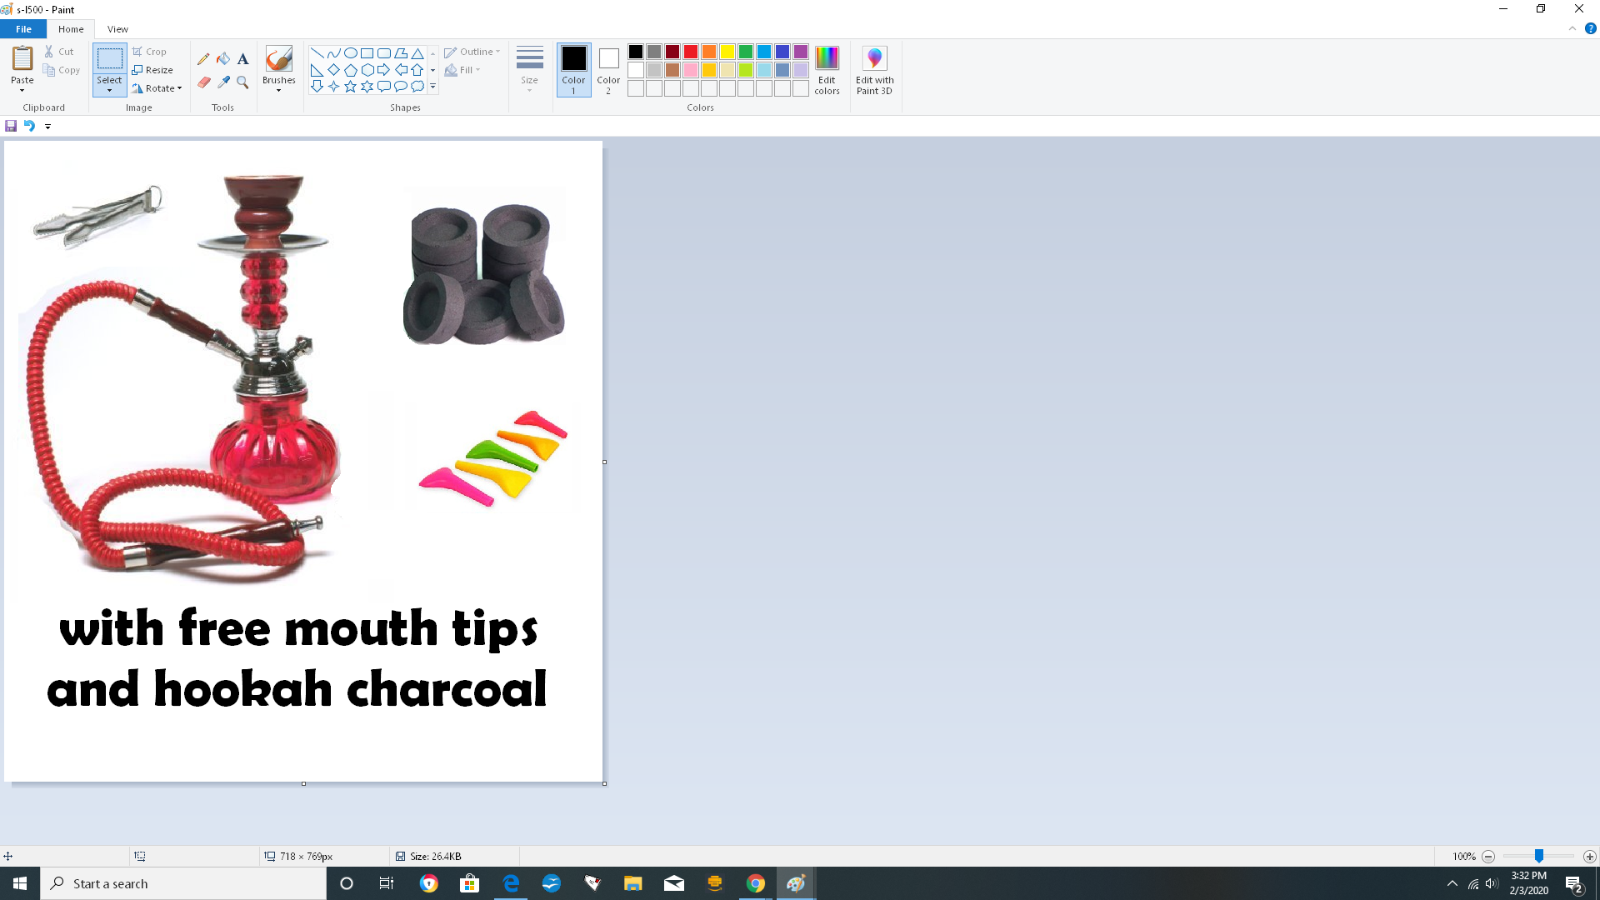 Hookah 1 Hose Decorative Smoking Nargila Glass Water Pipe Set W/ Tips Charcoal 6